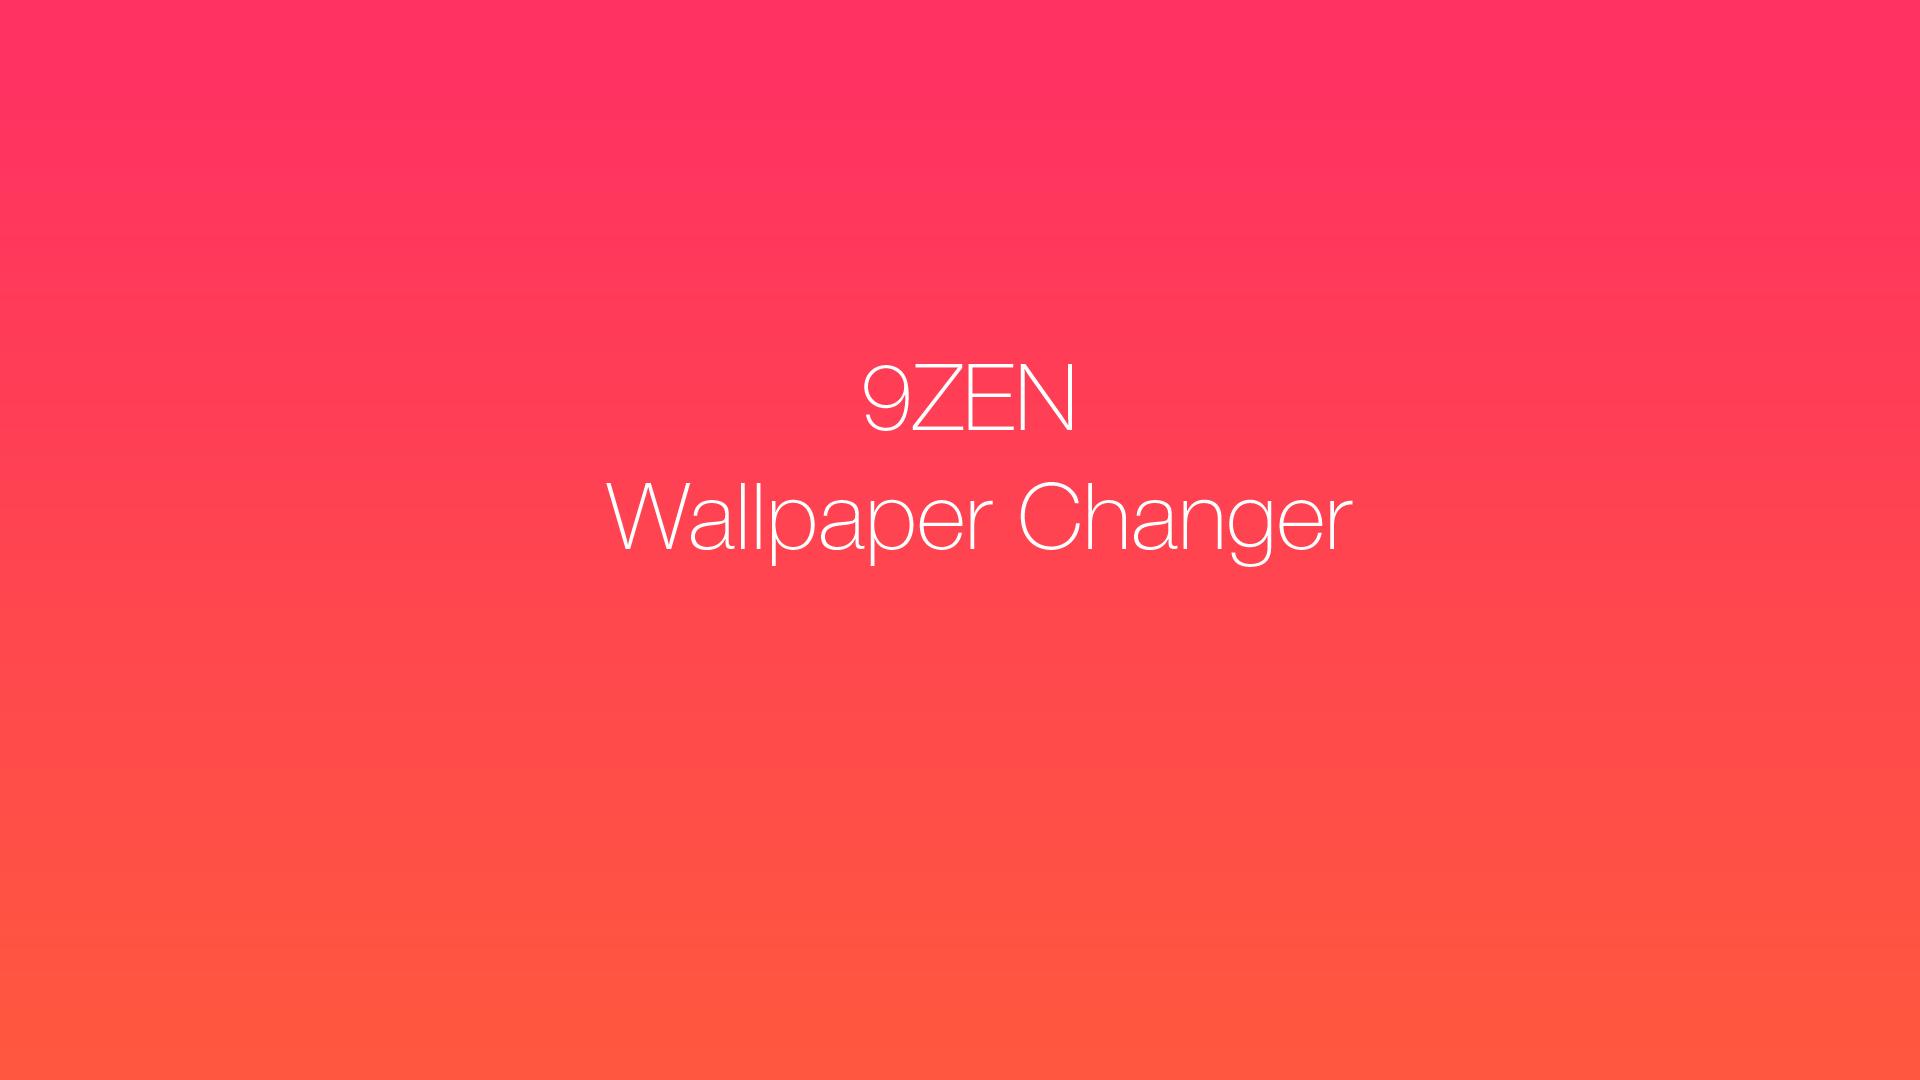 Baixar 9zen Wallpaper Changer Microsoft Store Pt Br